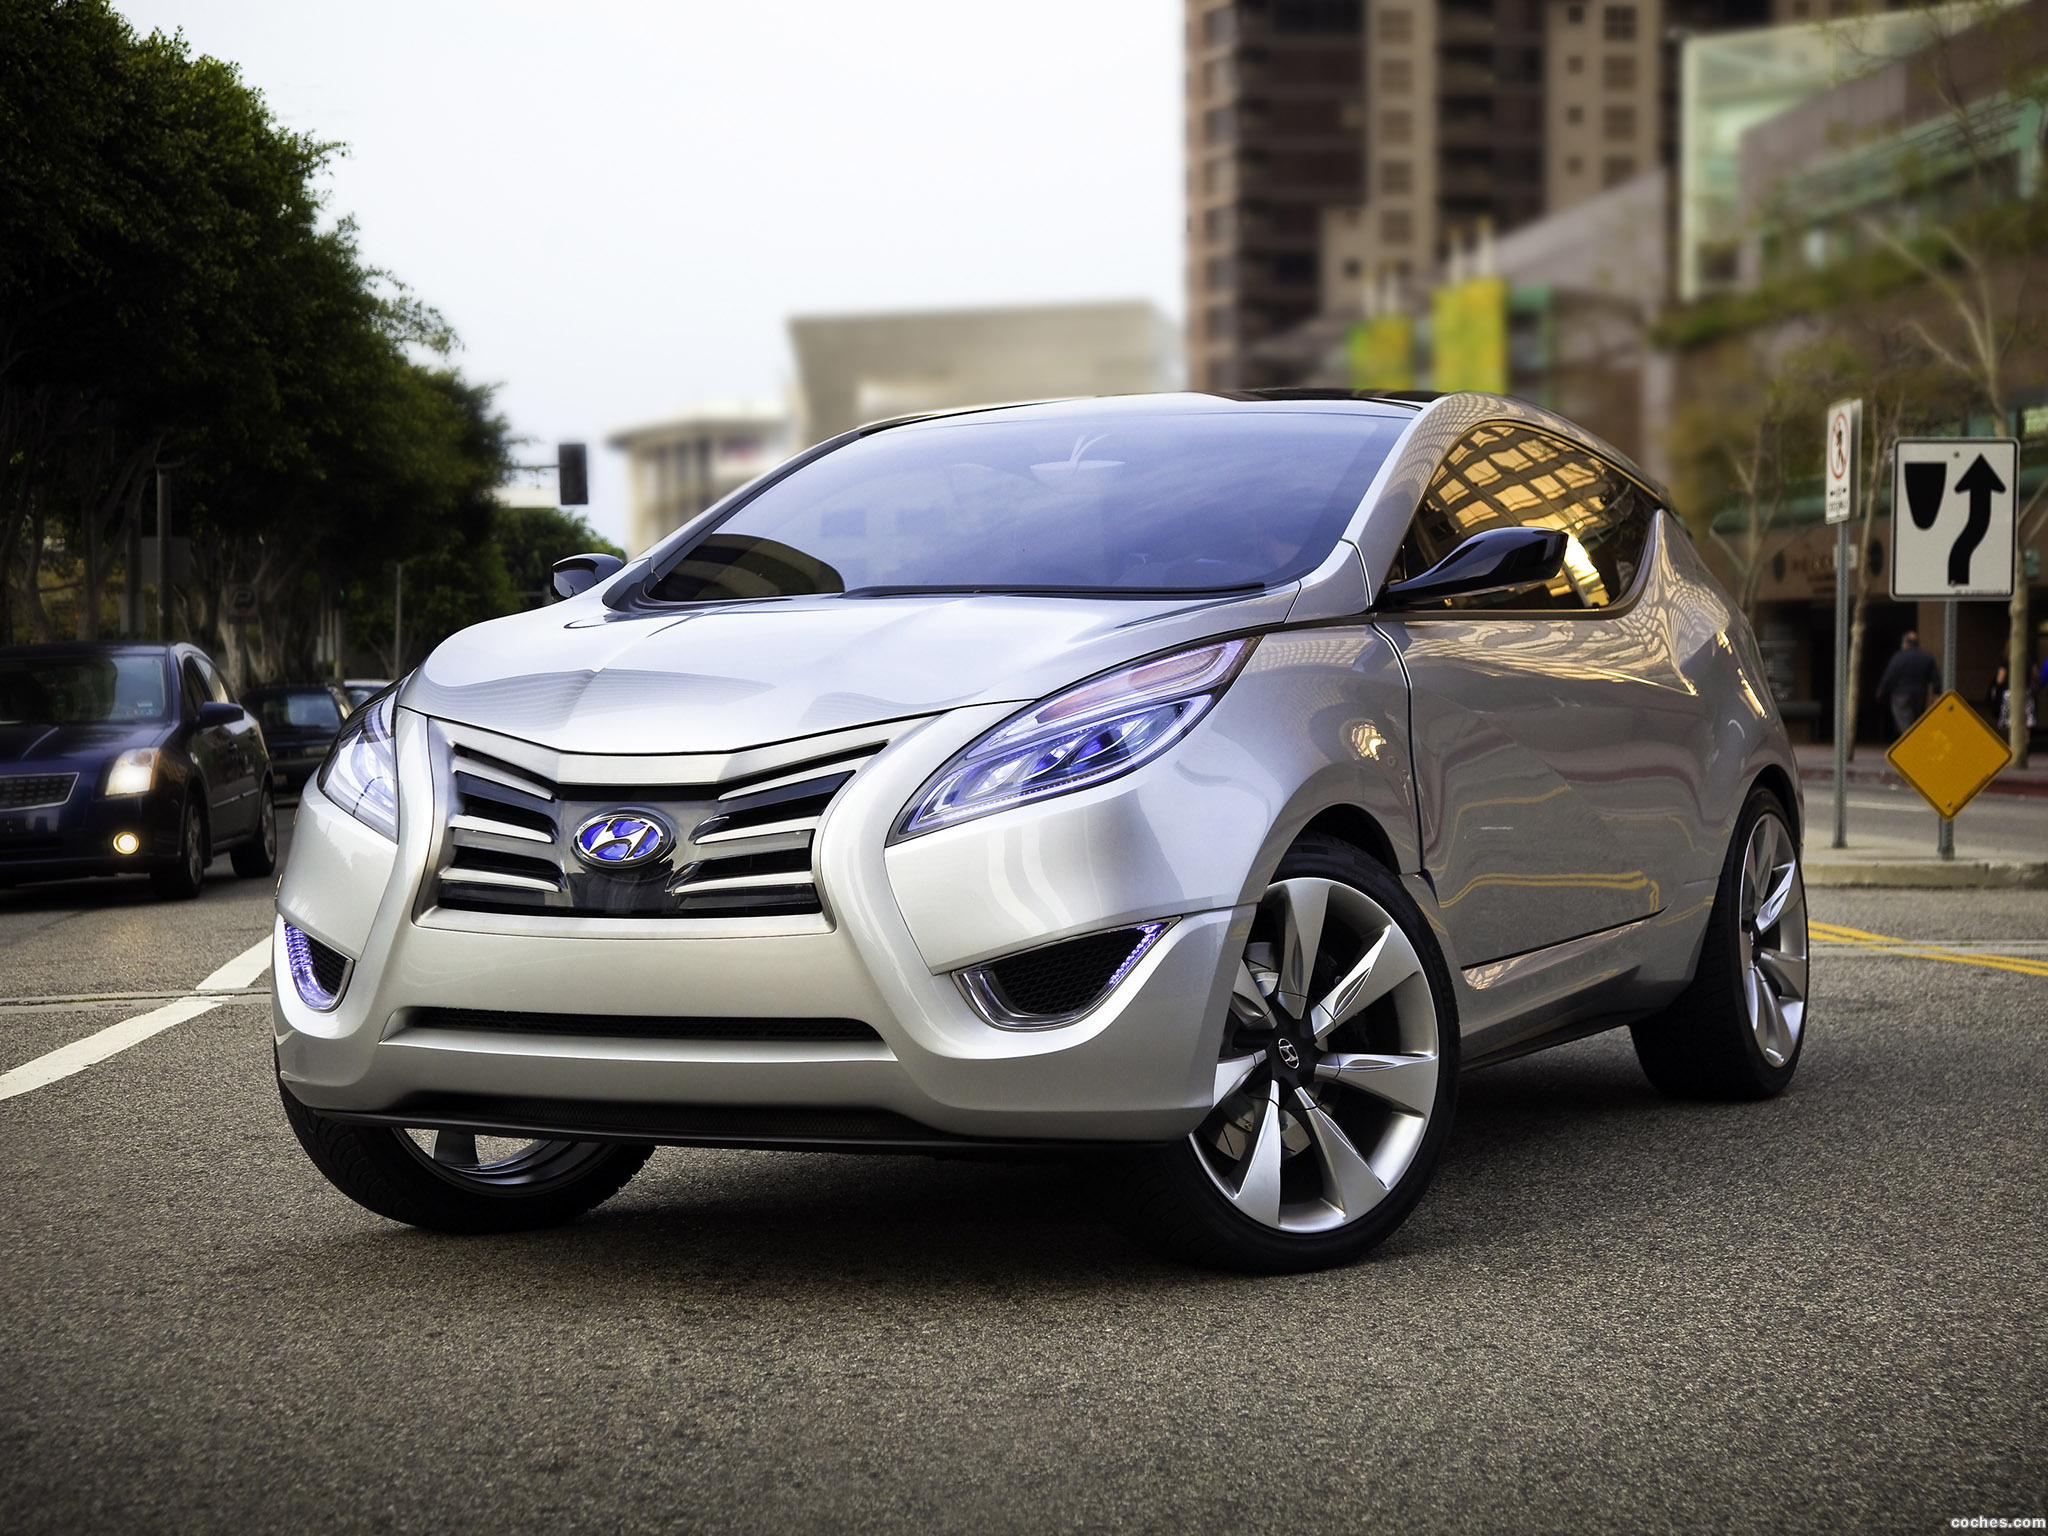 Foto 0 de Hyundai HCD 11 Nuvis Concept 2009